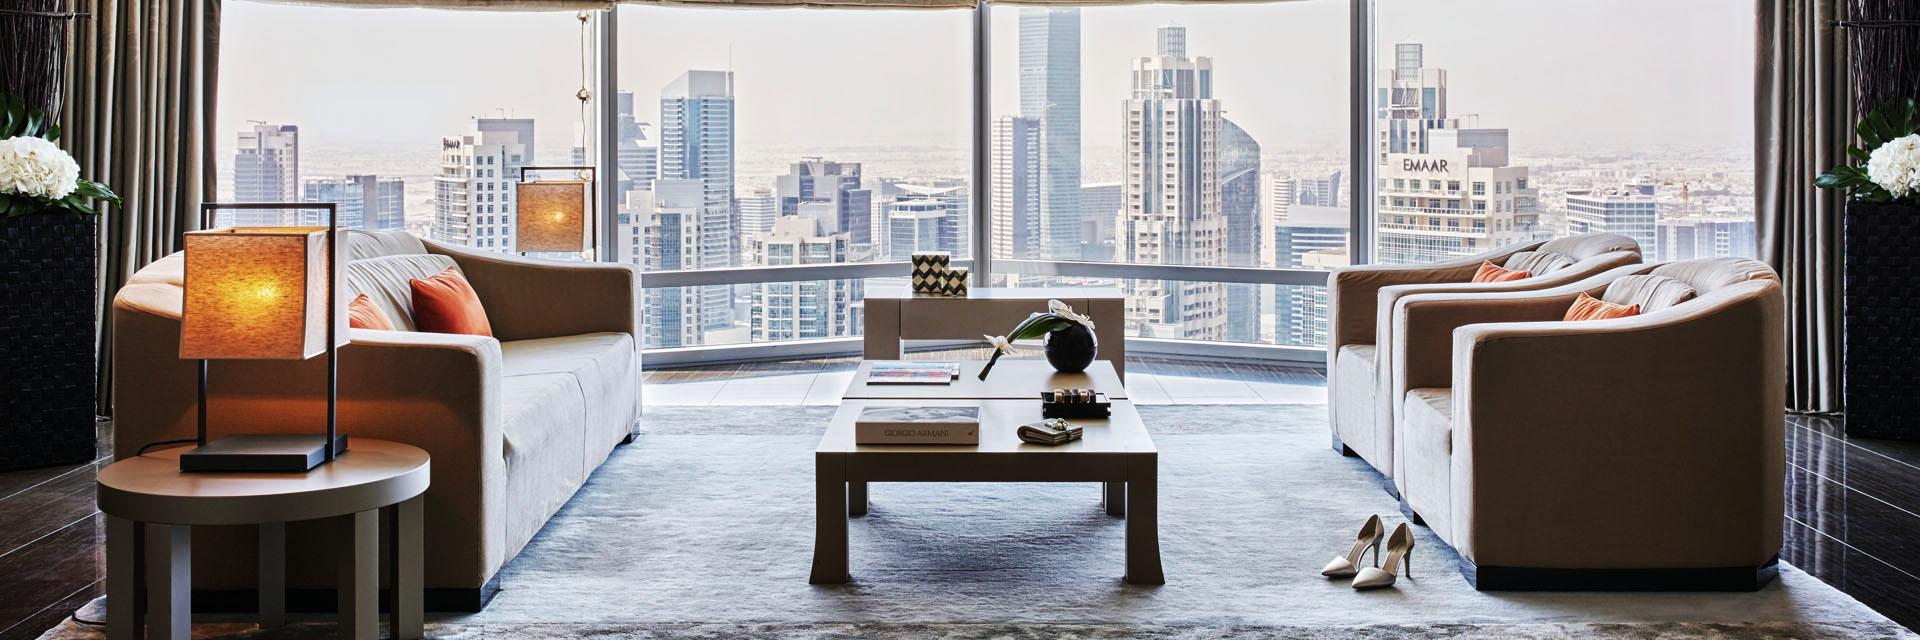 armani-dubai-signature-suite-living-room